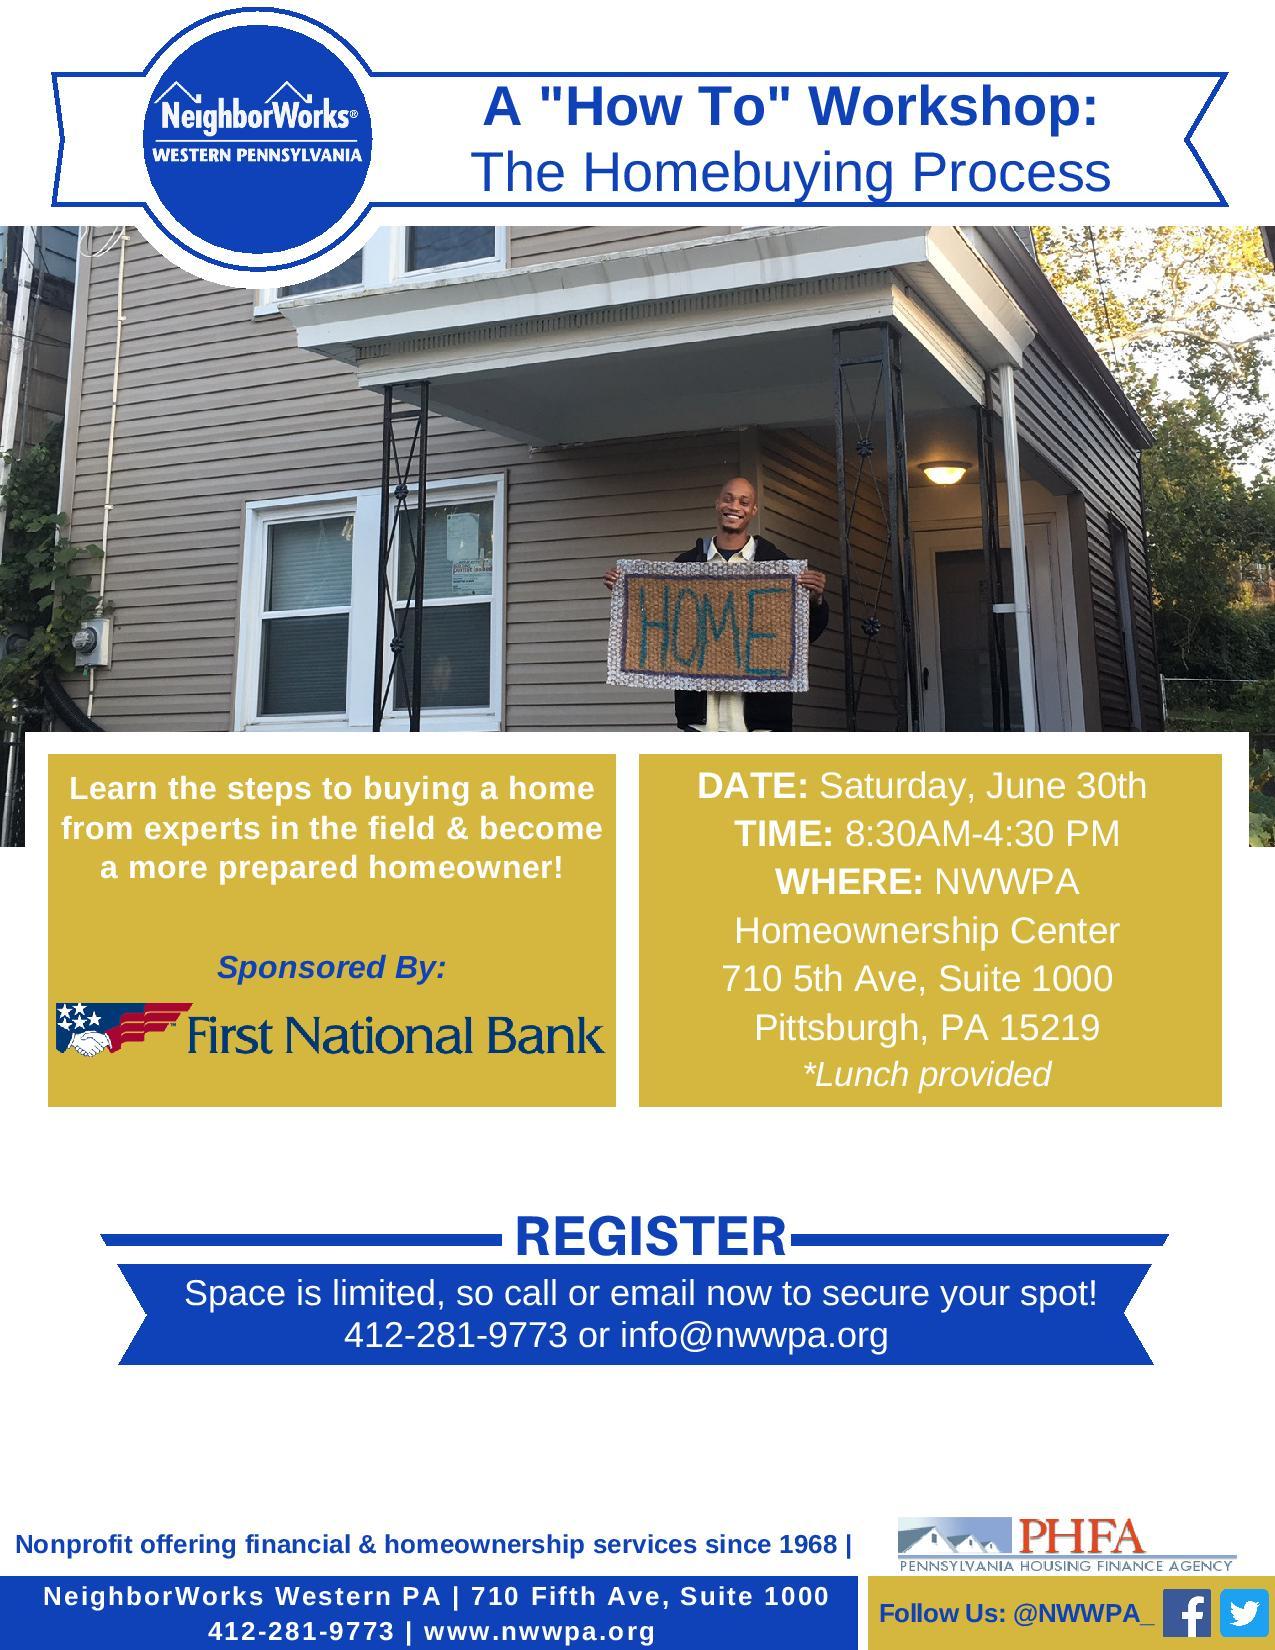 Homebuyer Workshop_First National Bank_6-30-18-page-001.jpg